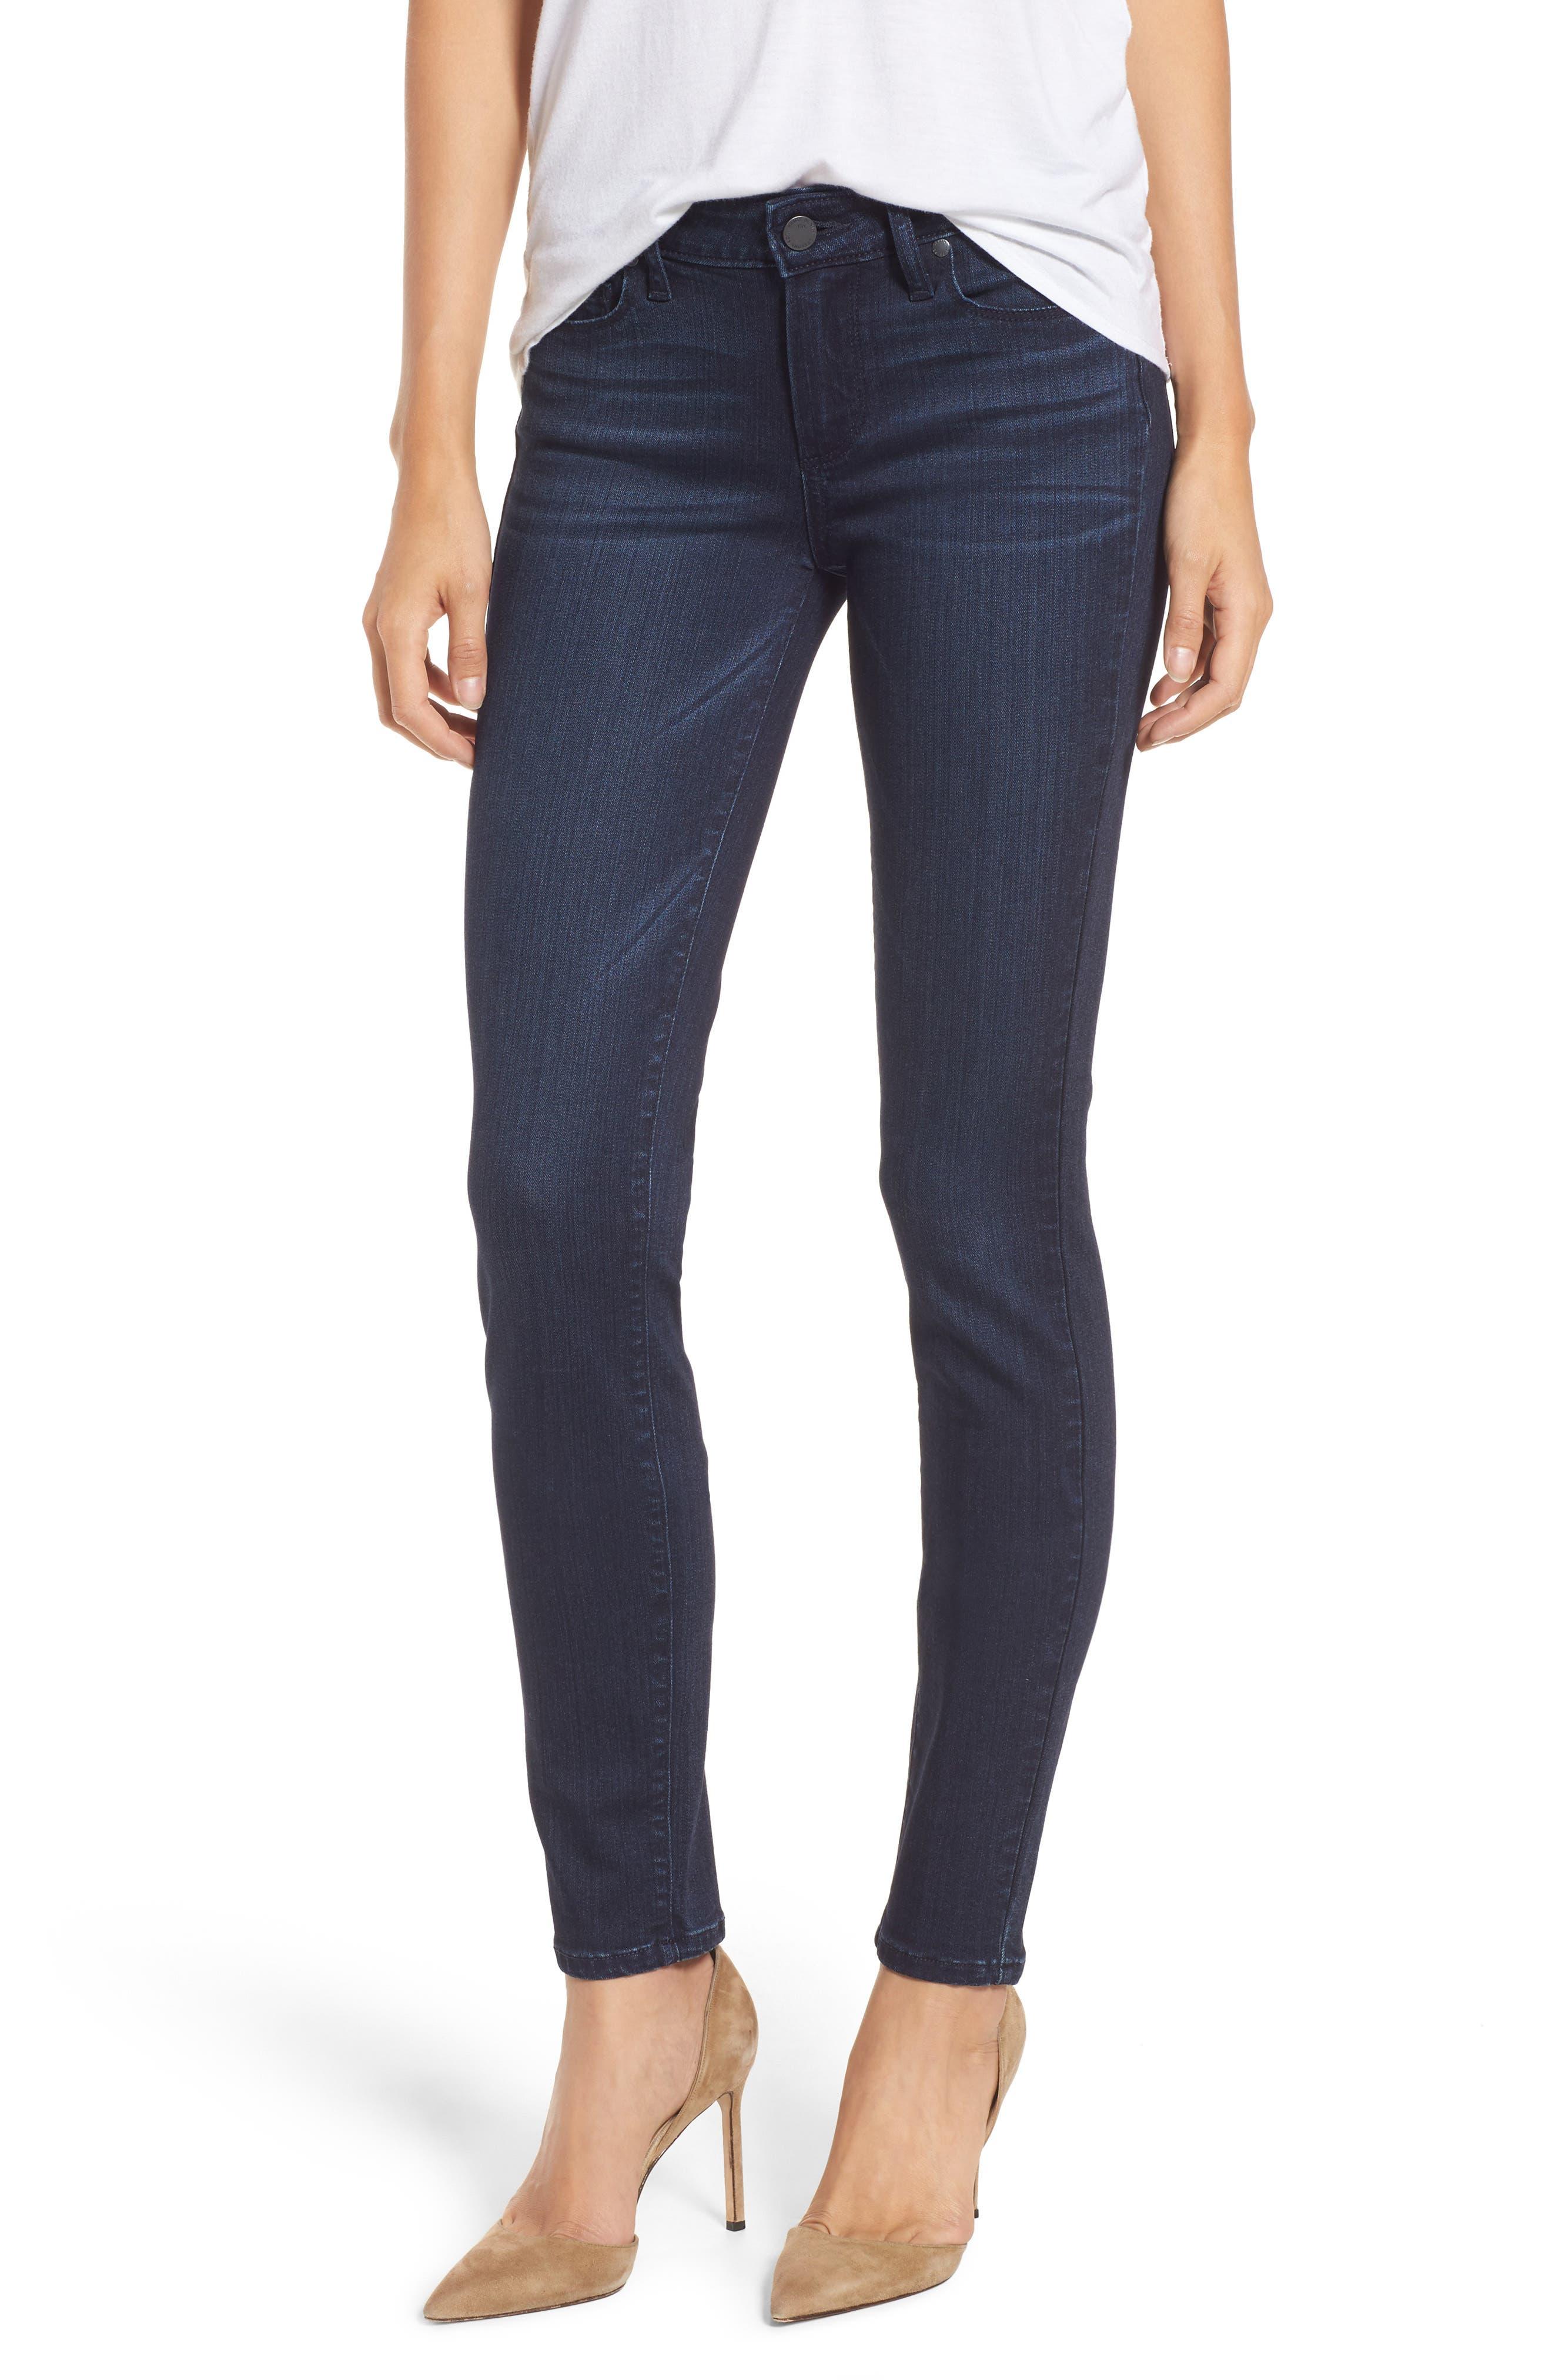 Transcend - Verdugo Ultra Skinny Jeans,                         Main,                         color, Hazen